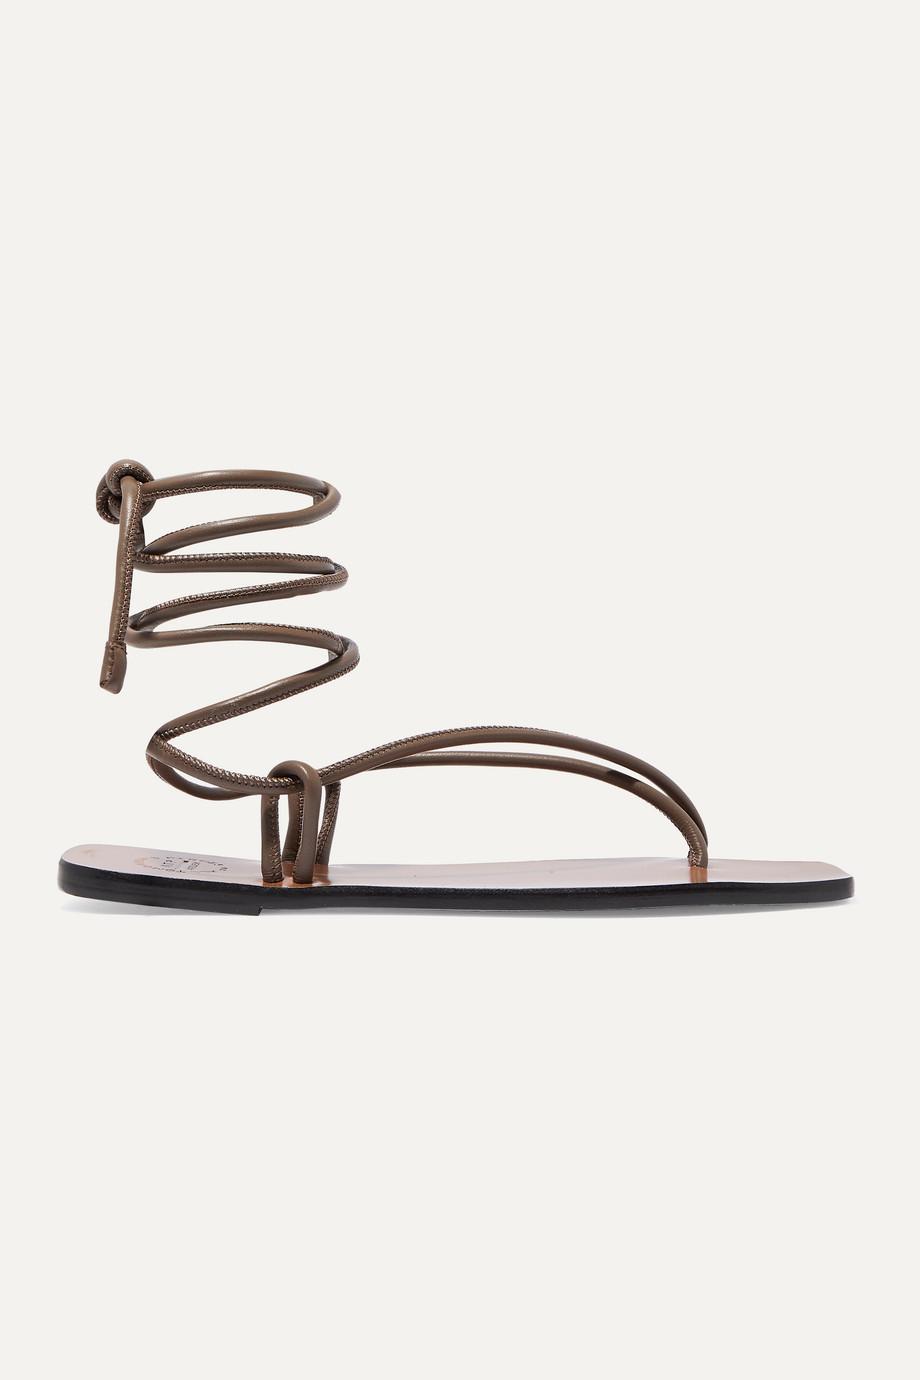 ATP Atelier Alezio leather sandals